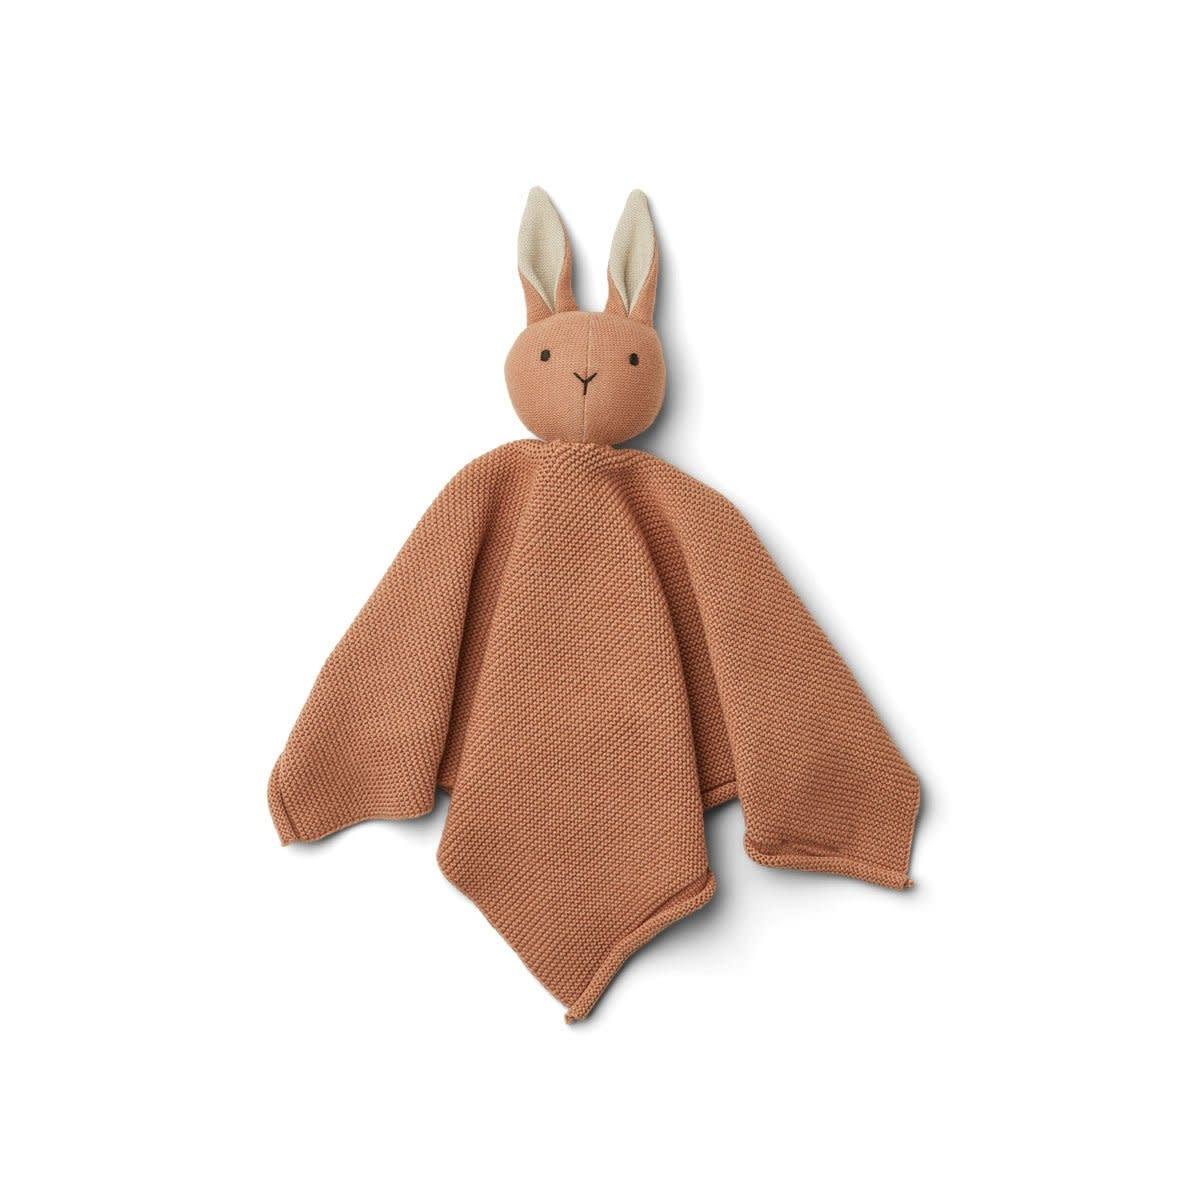 Milo knit cuddle cloth rabbit tuscany rose-1